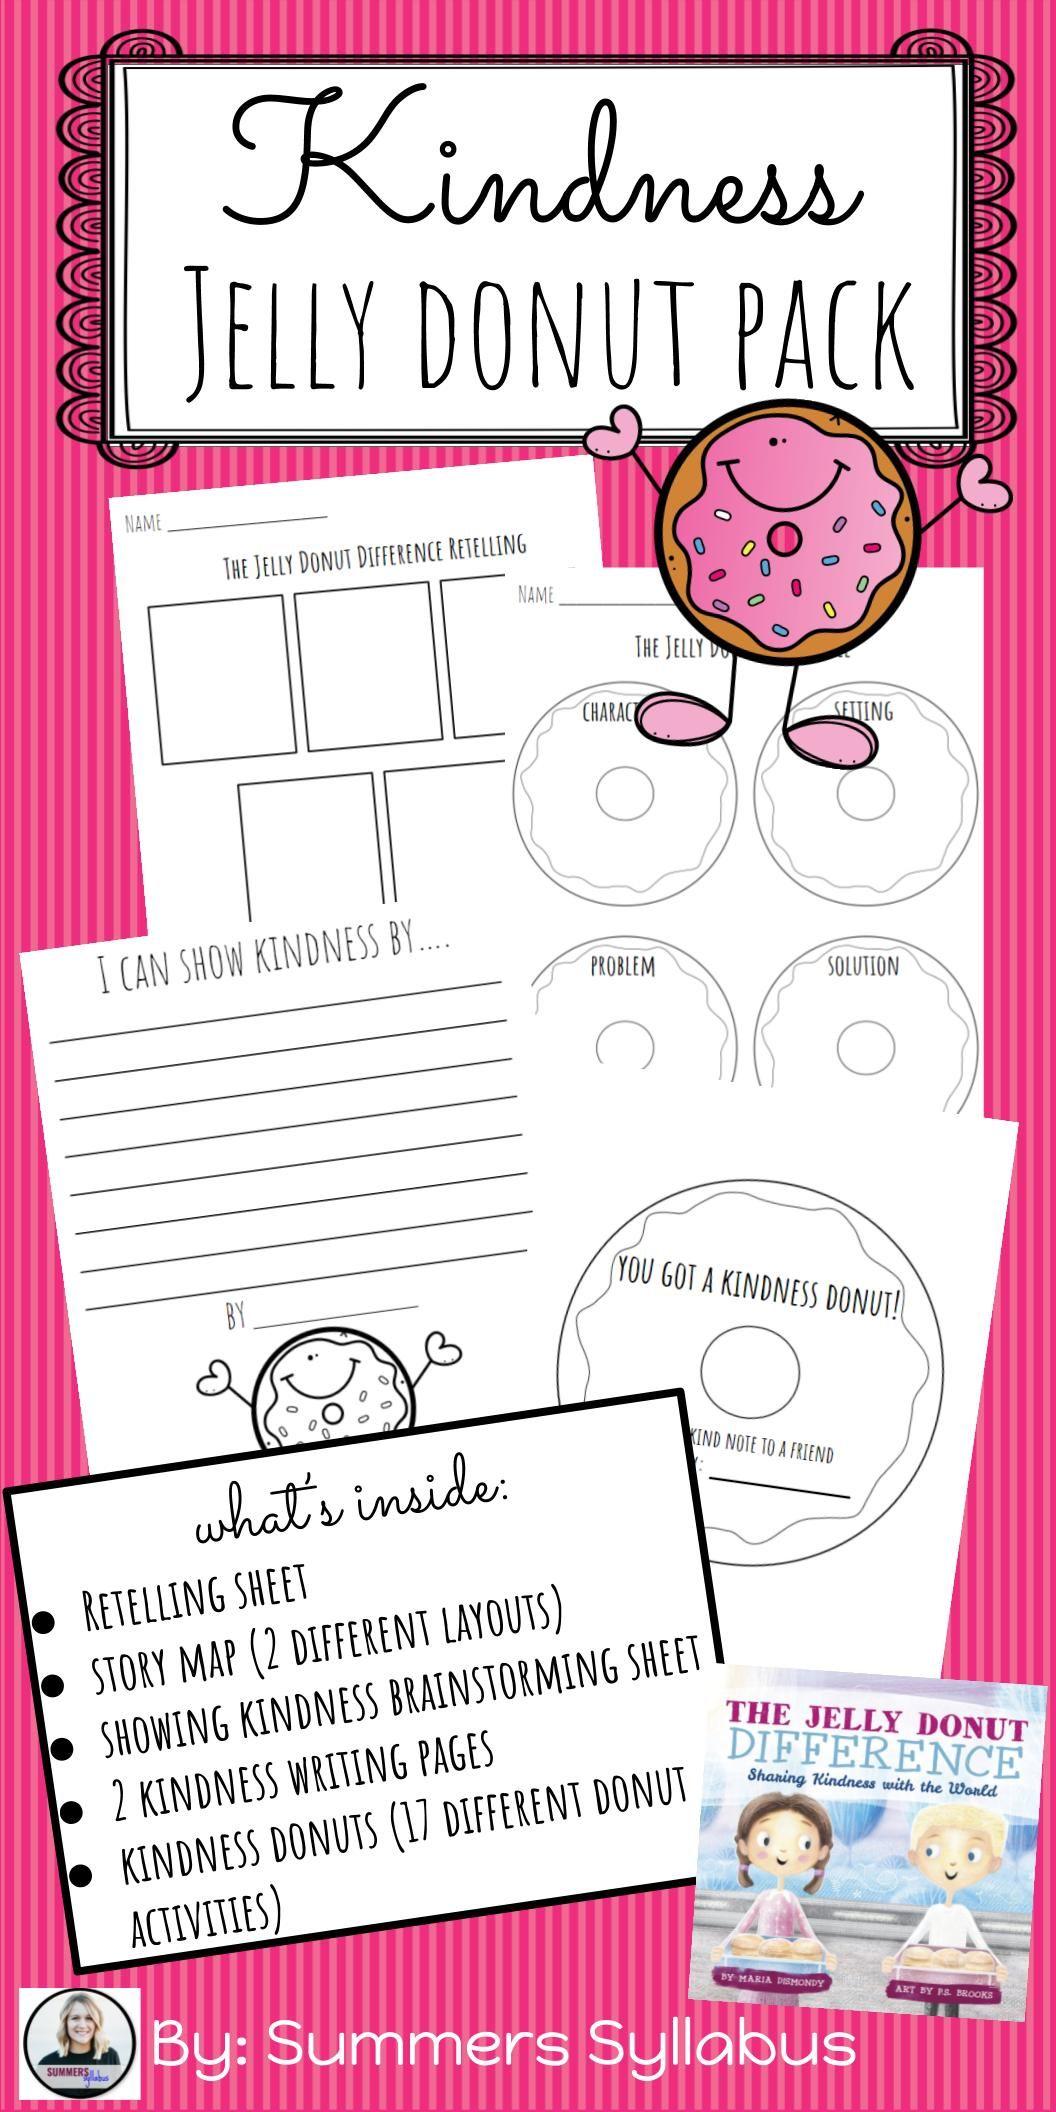 Kindness Jelly Donut Pack